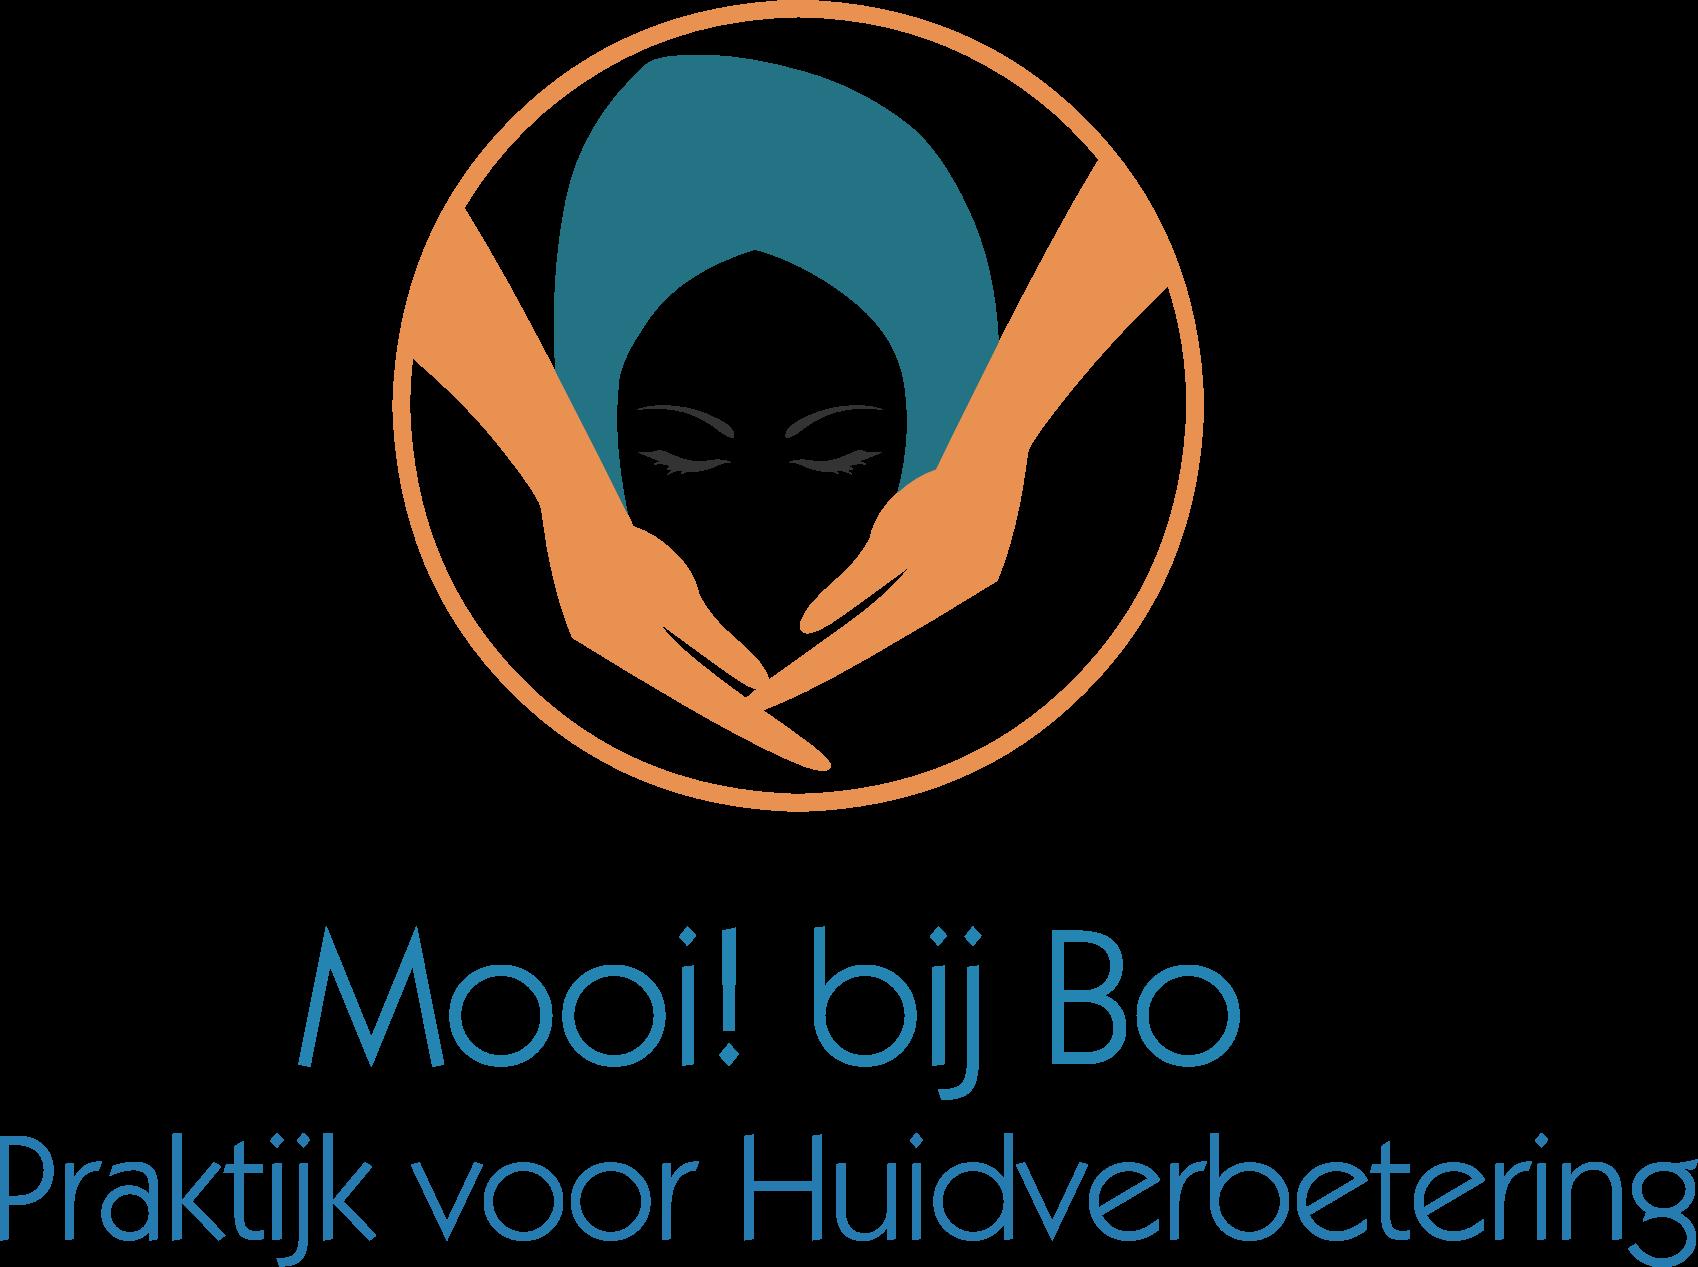 Mooibijbo.nl